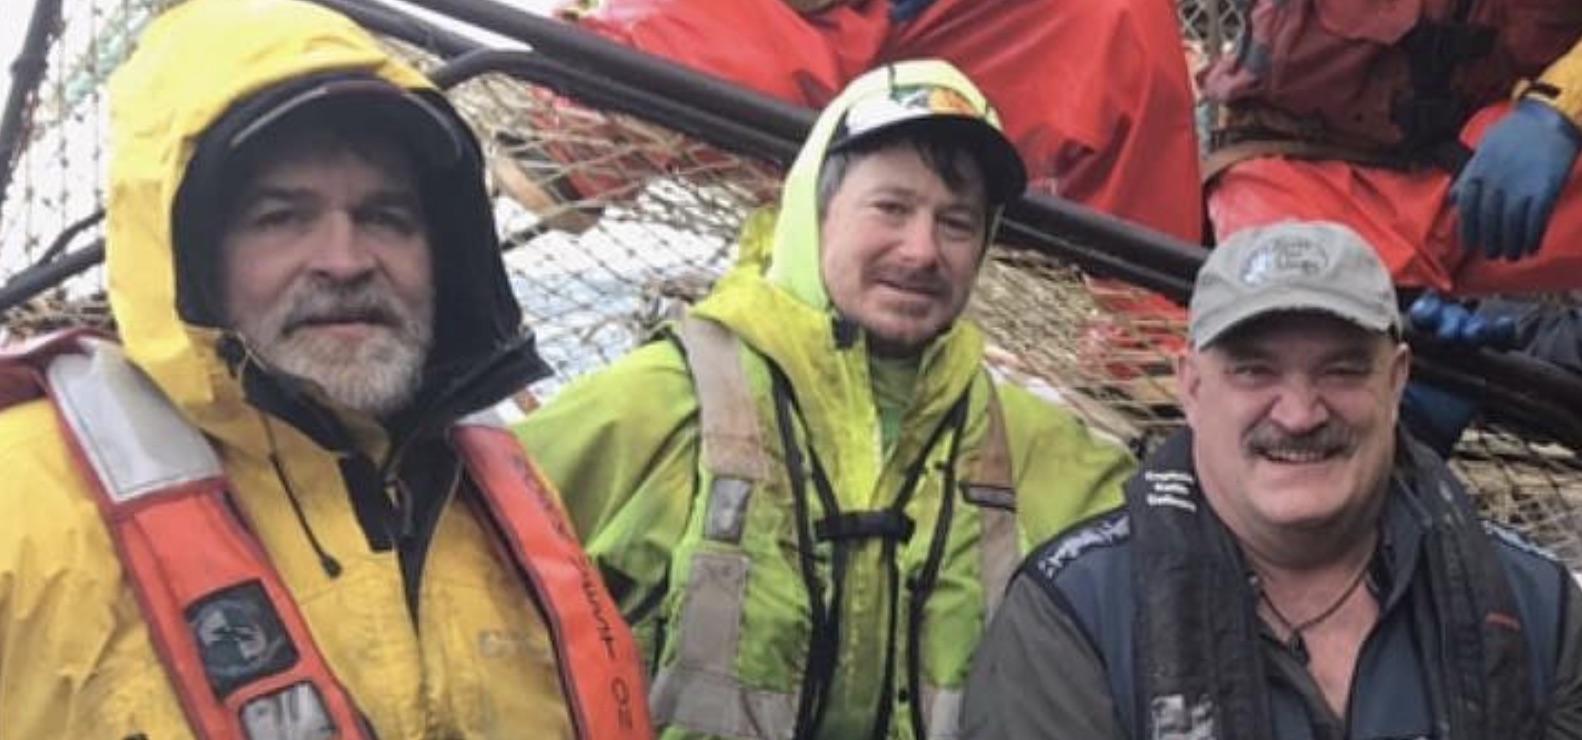 Keith Colburn, Deadliest Catch-https://www.instagram.com/p/BUvRiHmF3v7/